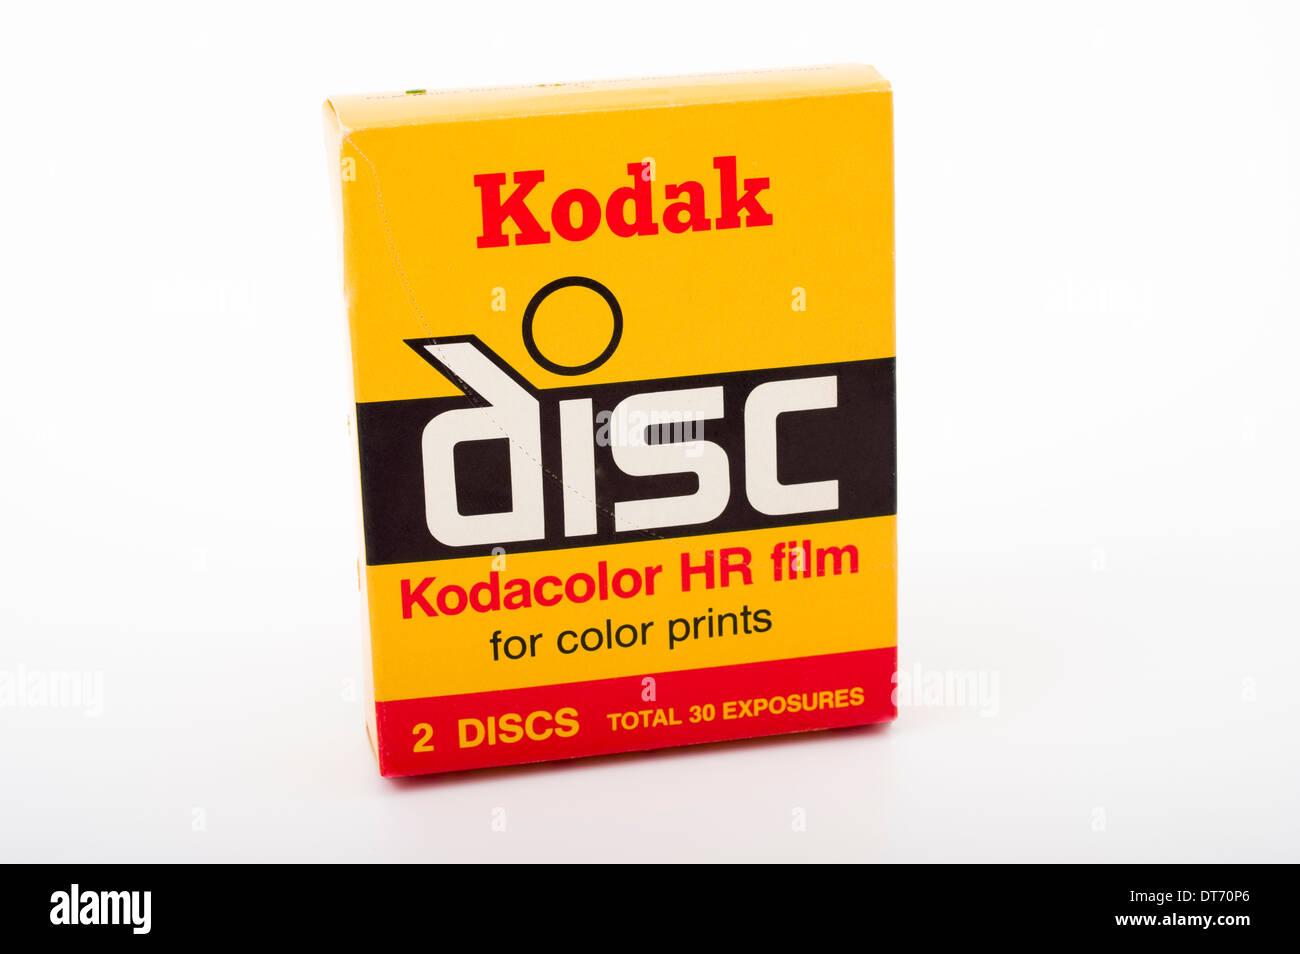 Kodak Color Film Stock Photos Kodak Color Film Stock Images Alamy